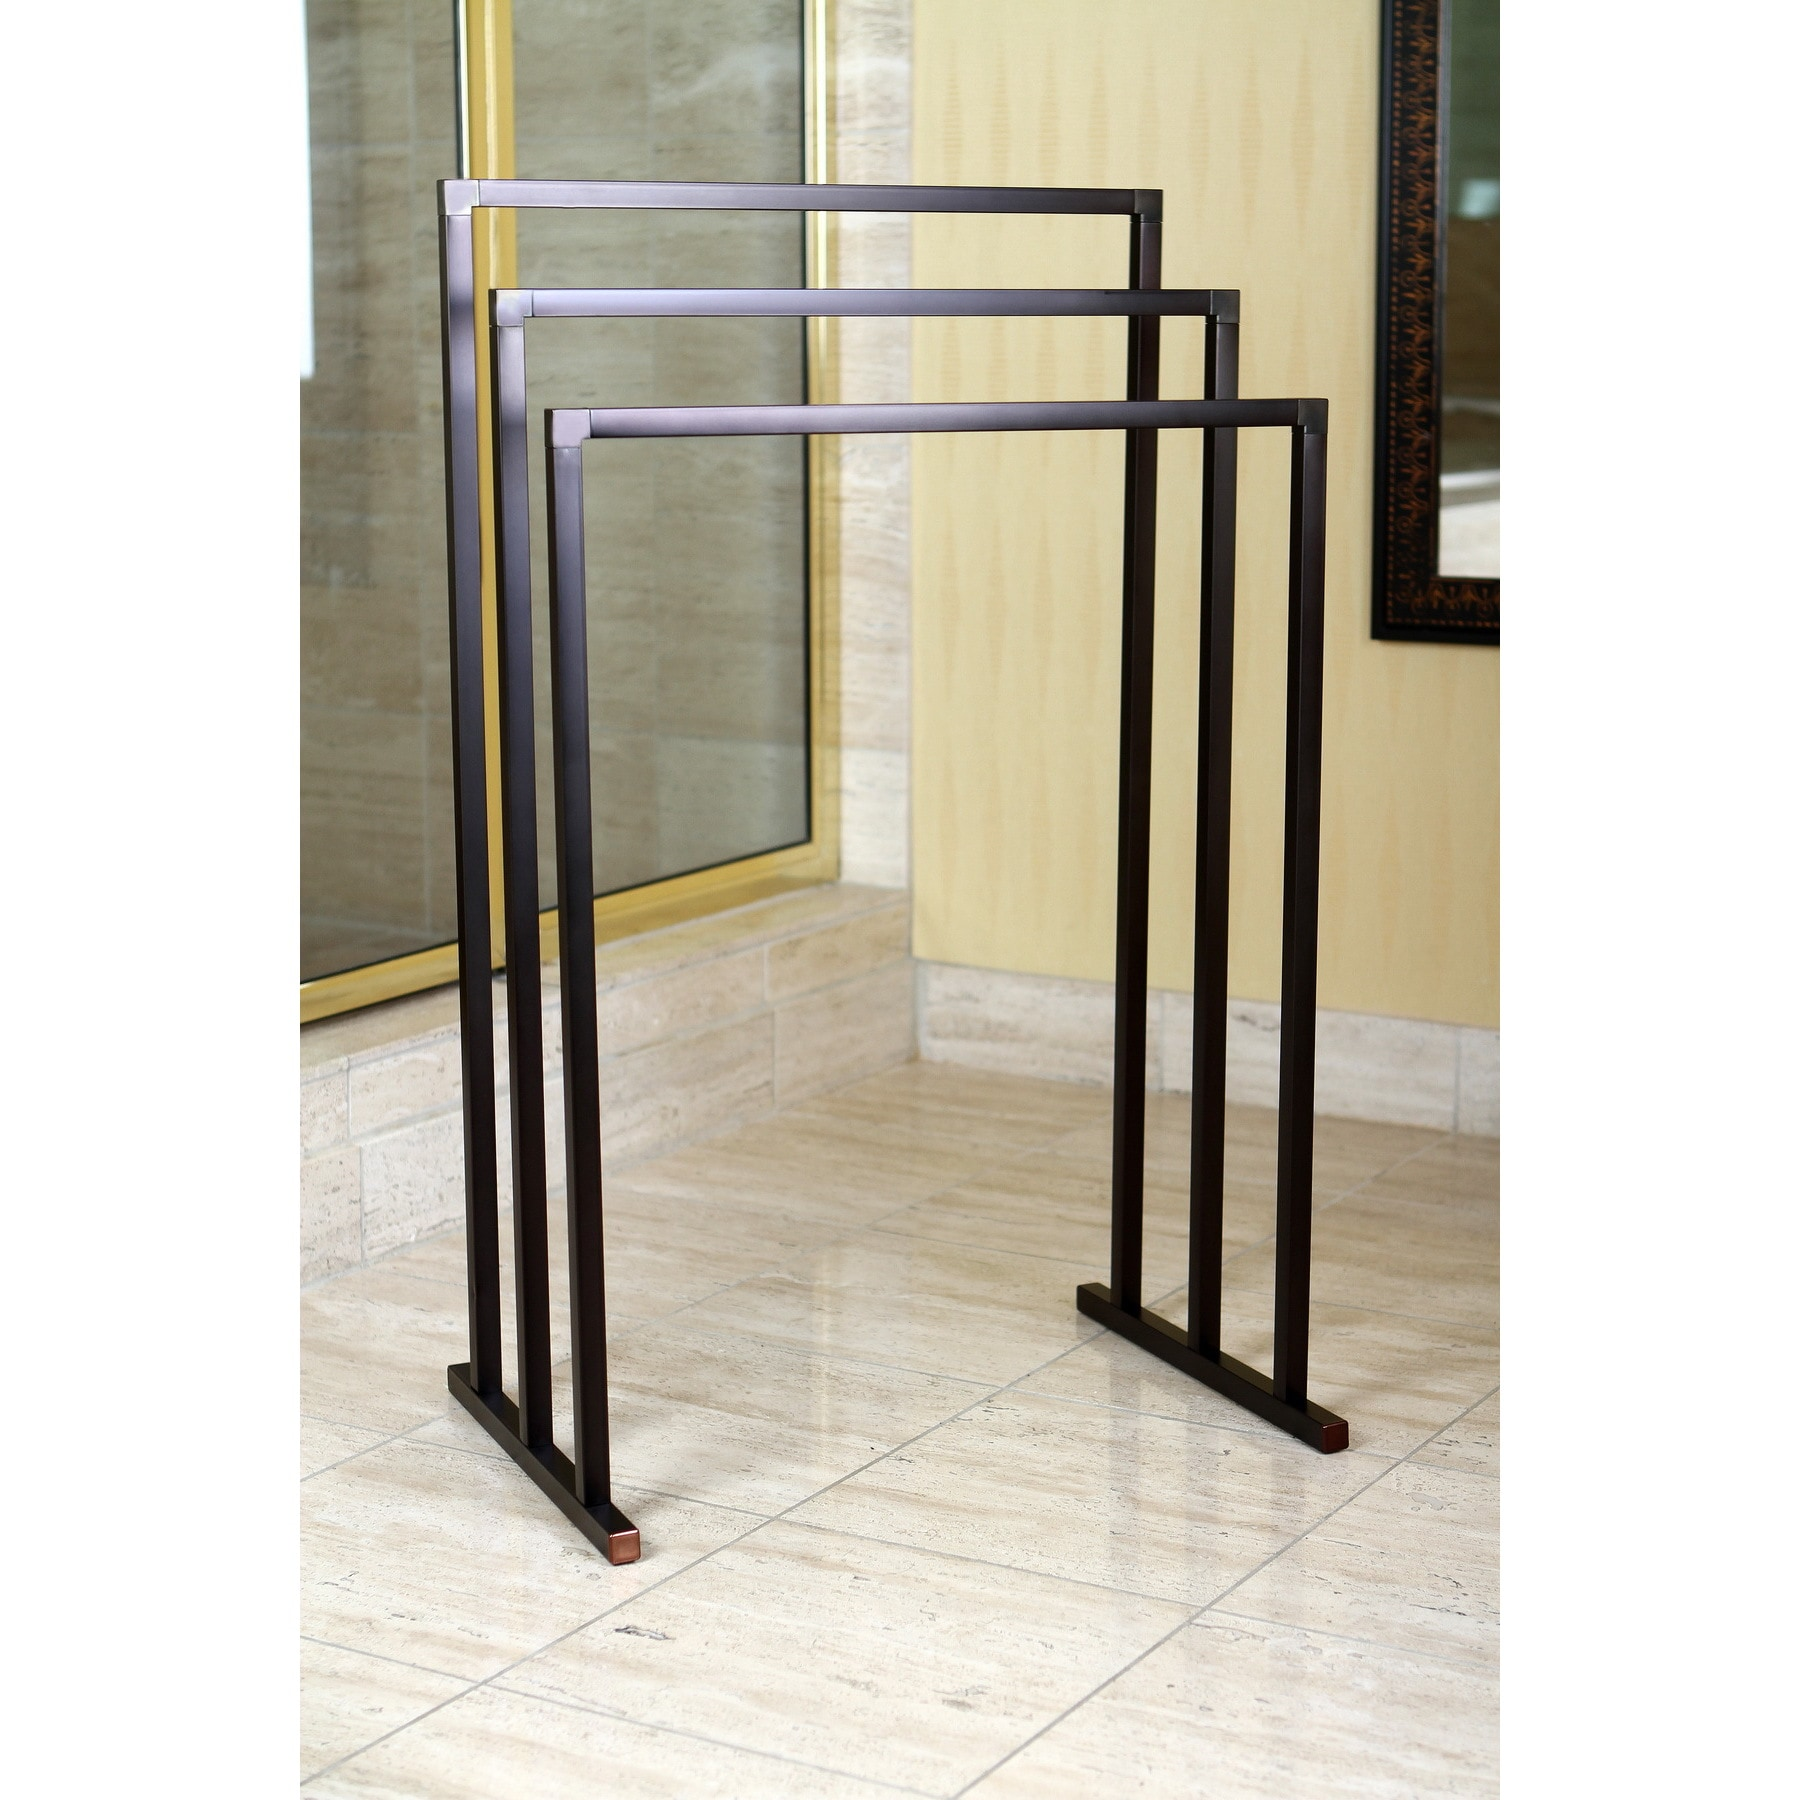 Shop Pedestal Oil Rubbed Bronze 3-tier Iron Towel Rack - Free ...